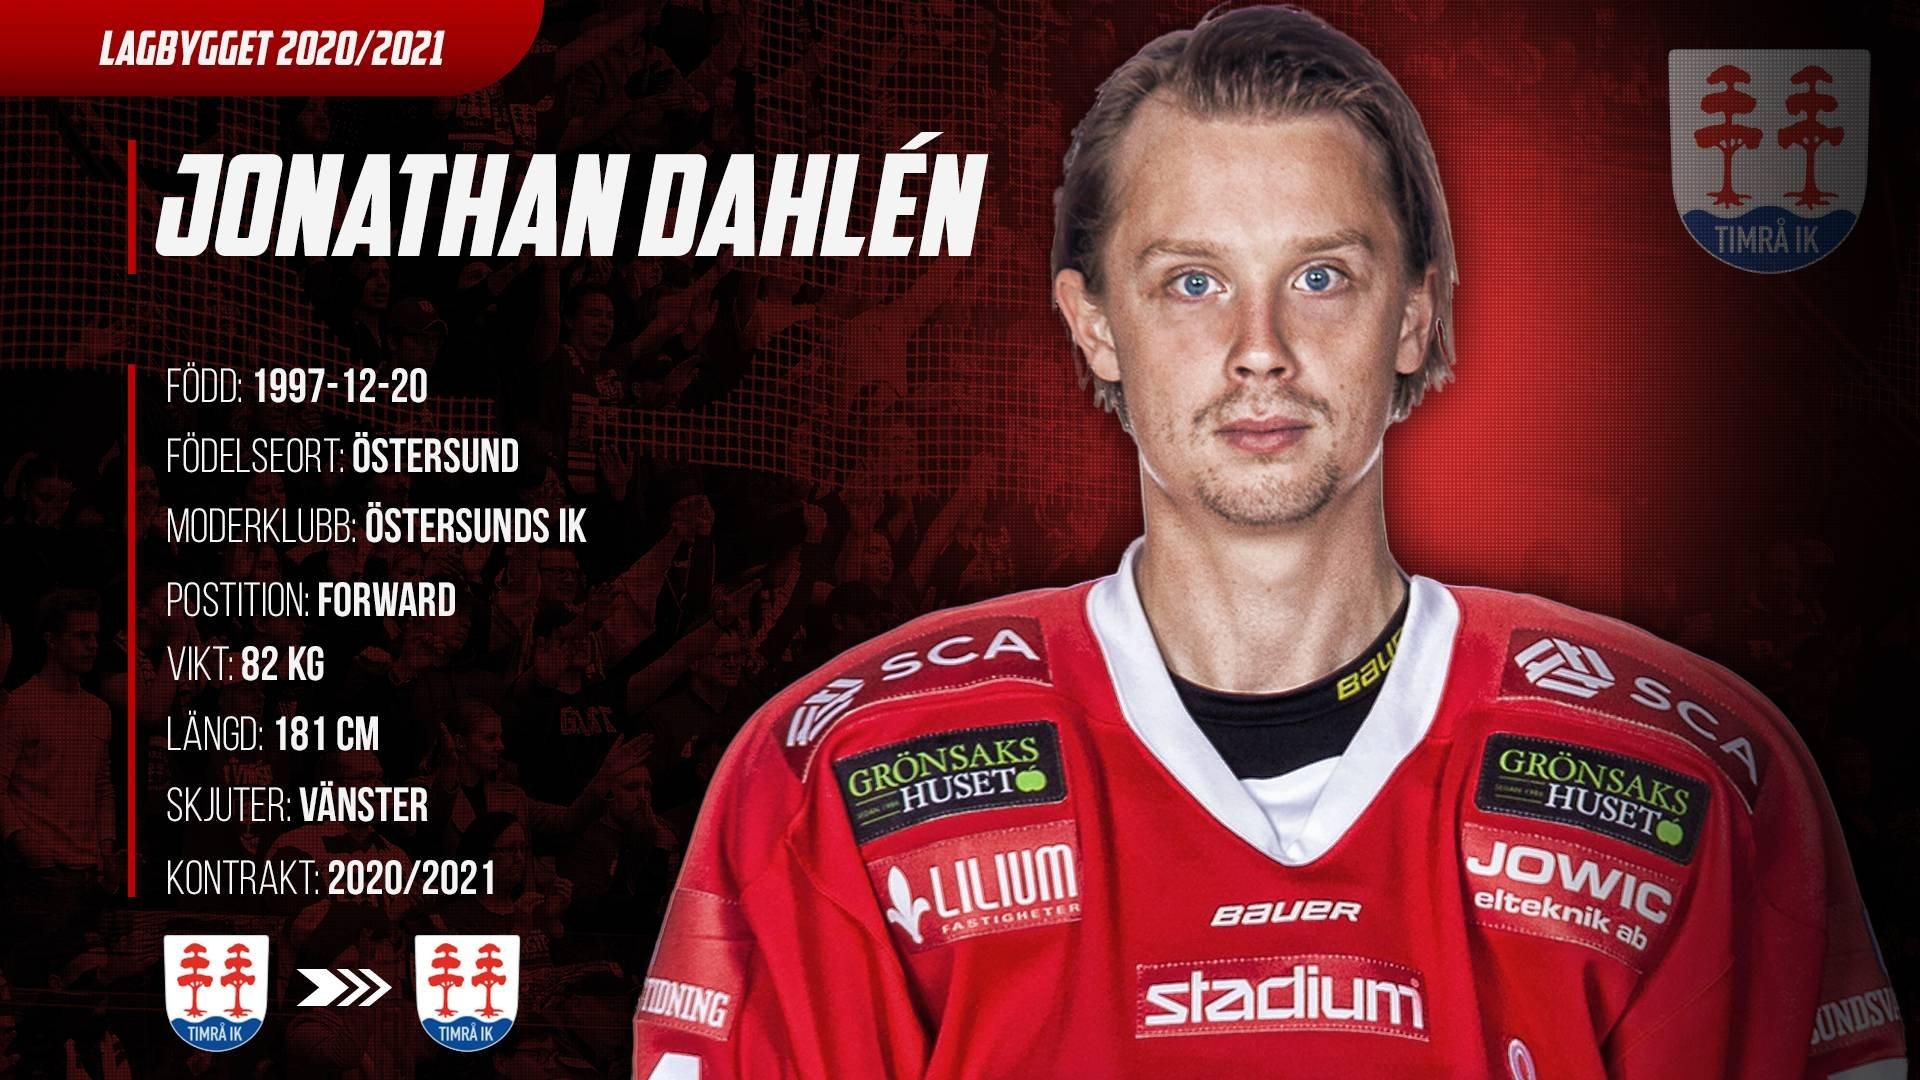 Dahlen Highlights